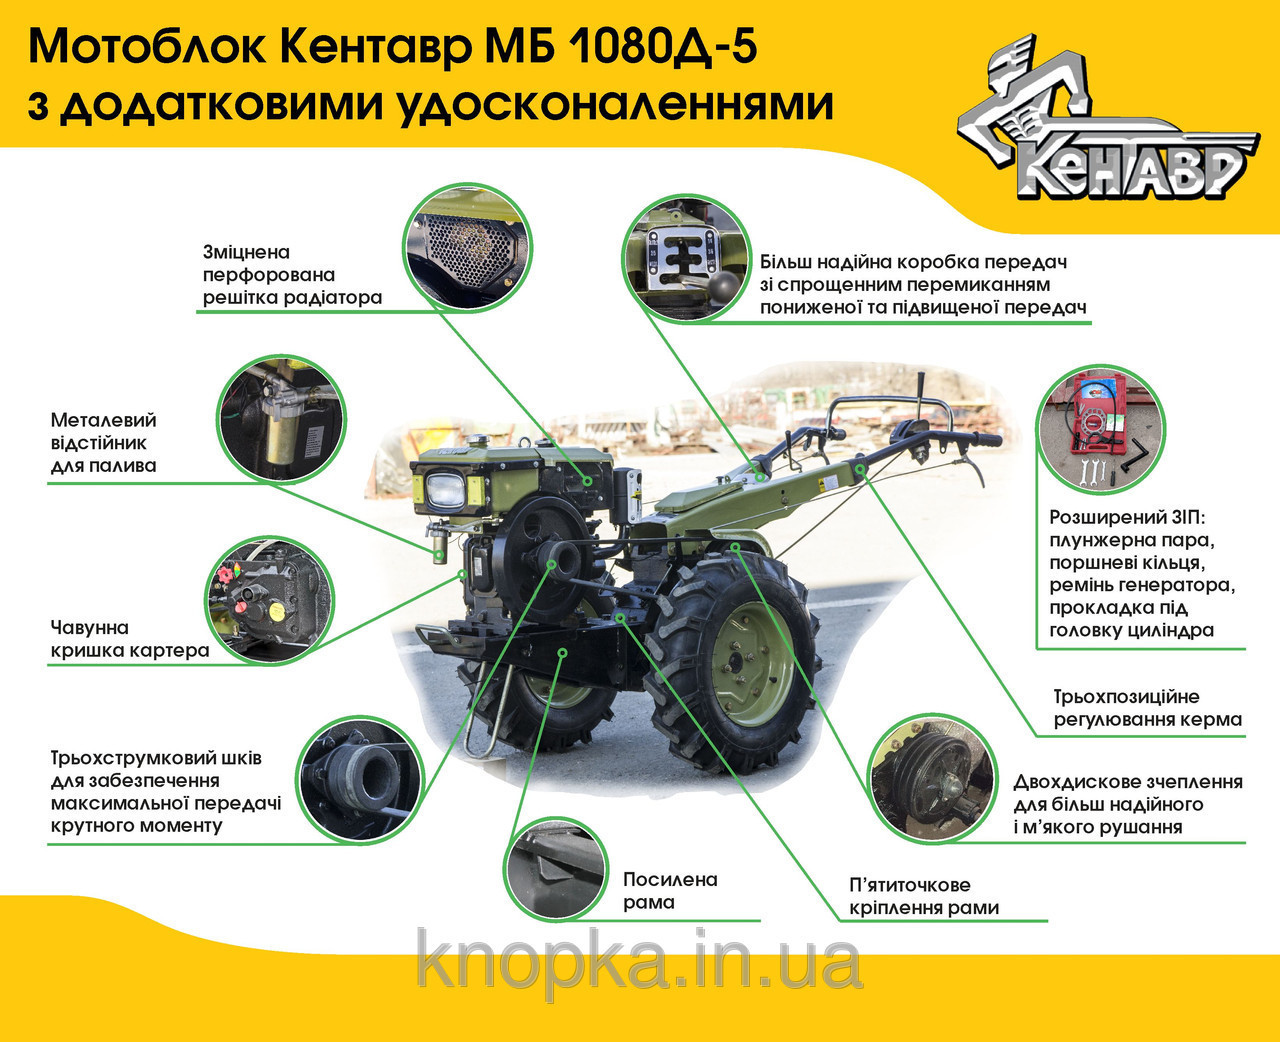 Мотоблок Кентавр МБ 1080Д-5 (8 л.с., дизель, чугунная крышка картера)